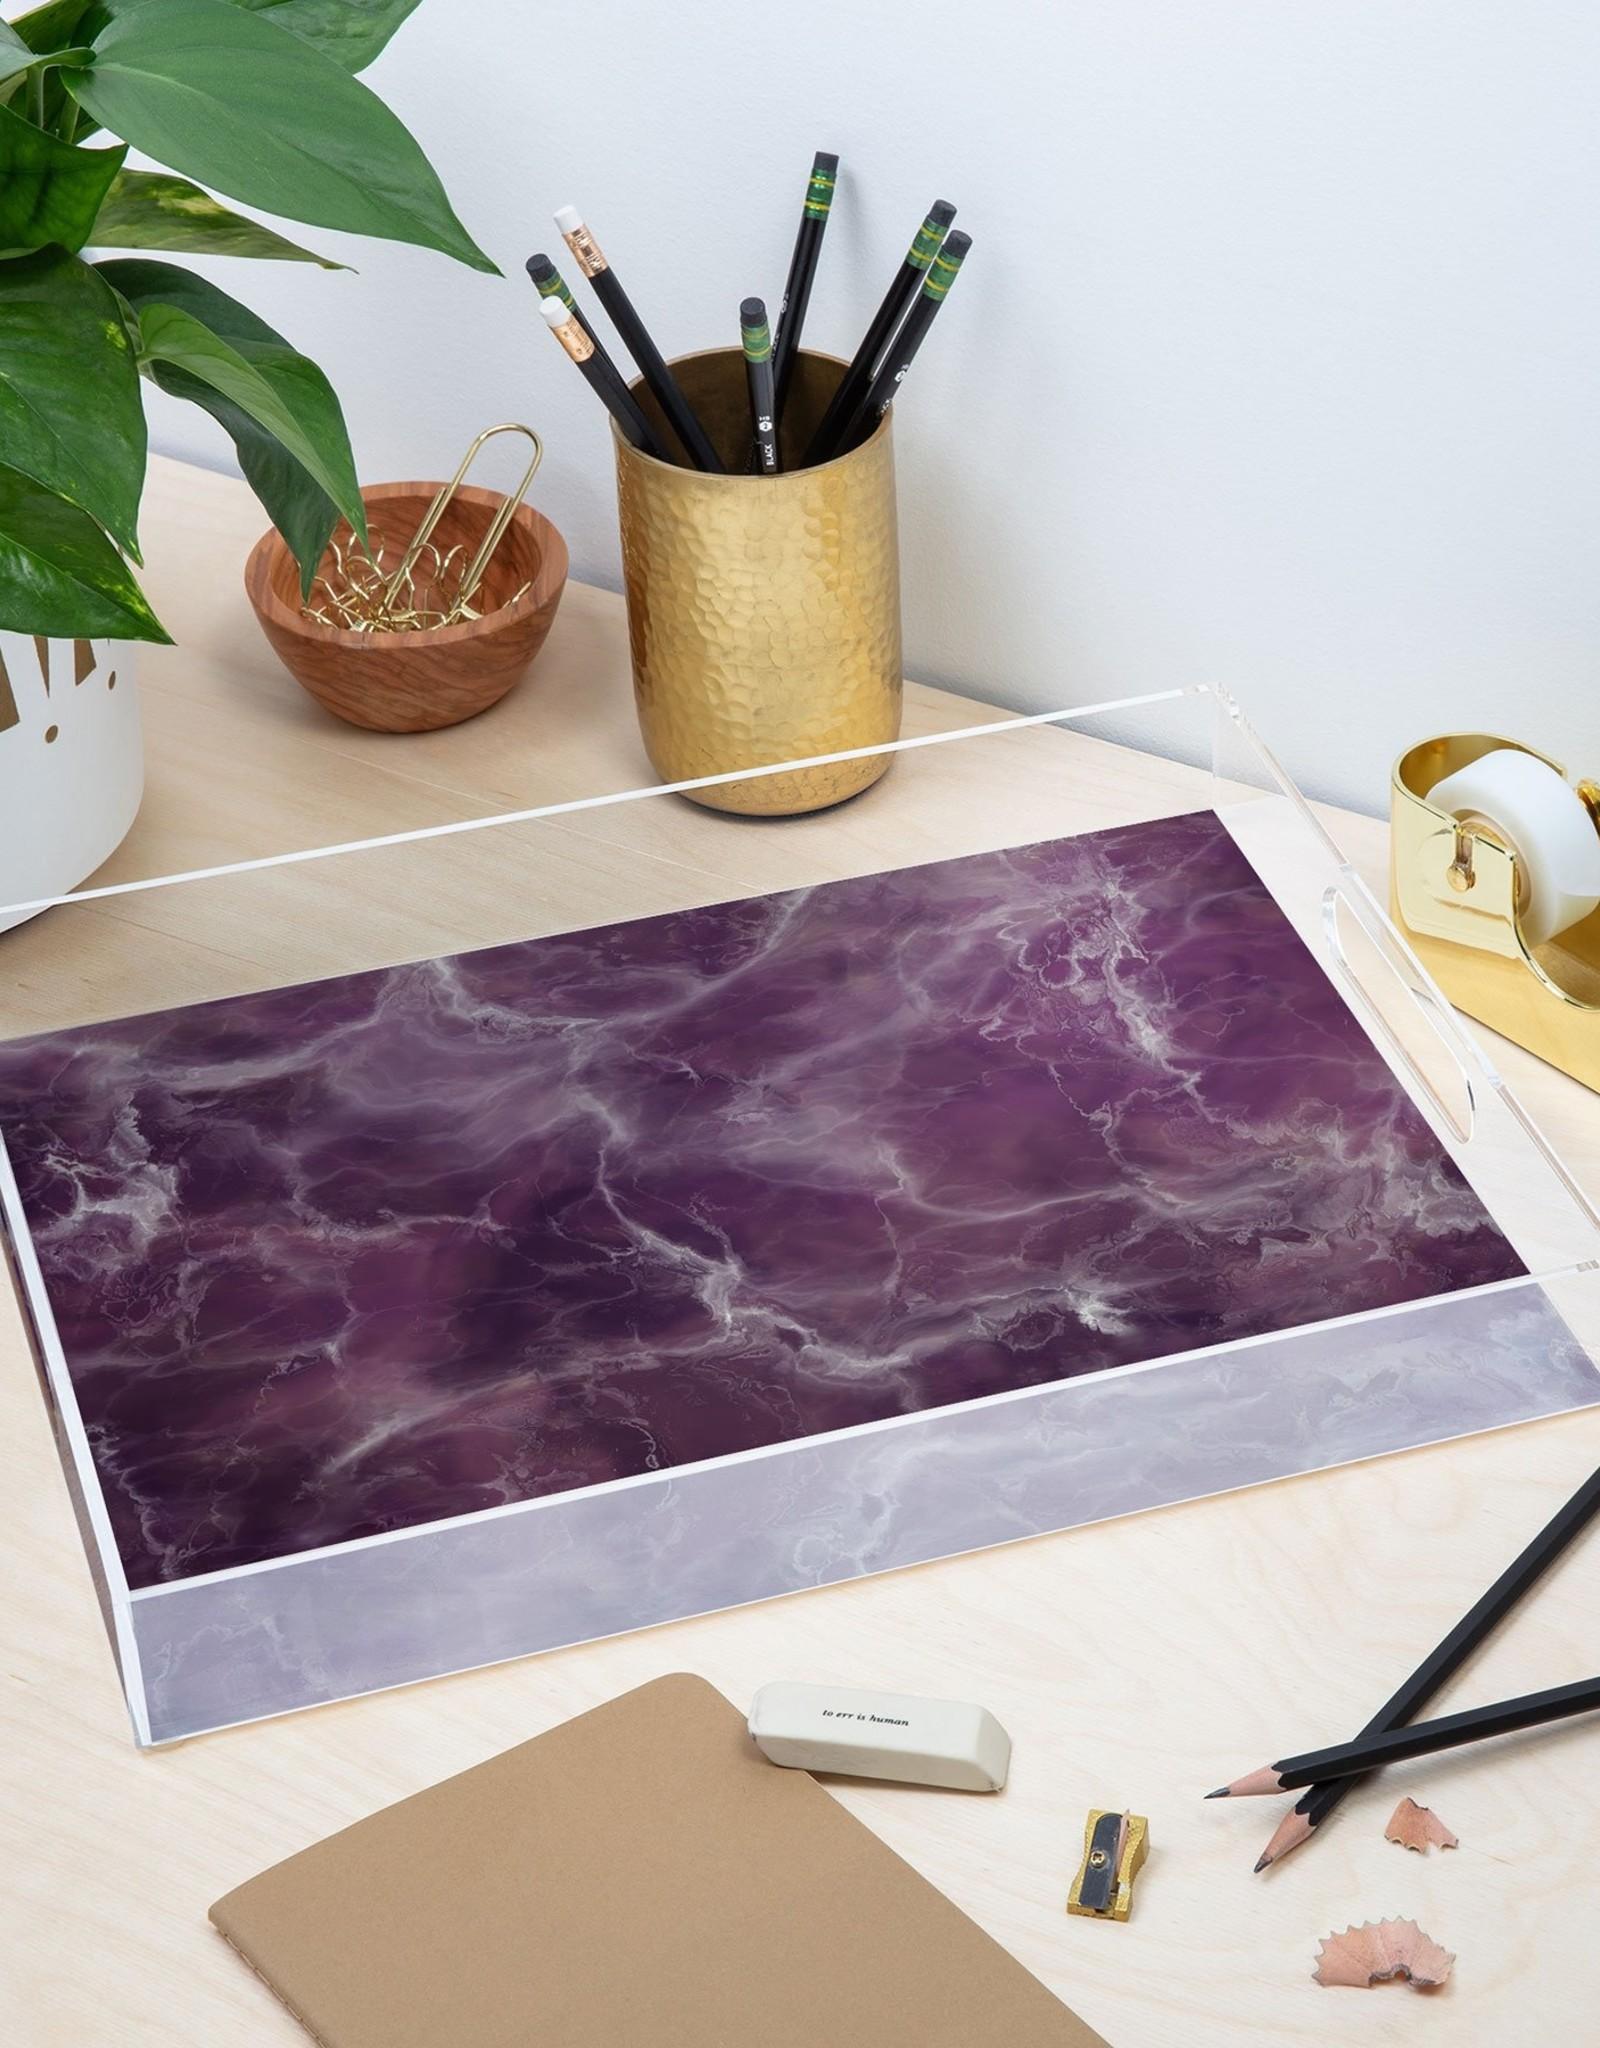 Deny Designs Large Tray - Acrylic: Amethyst Marble